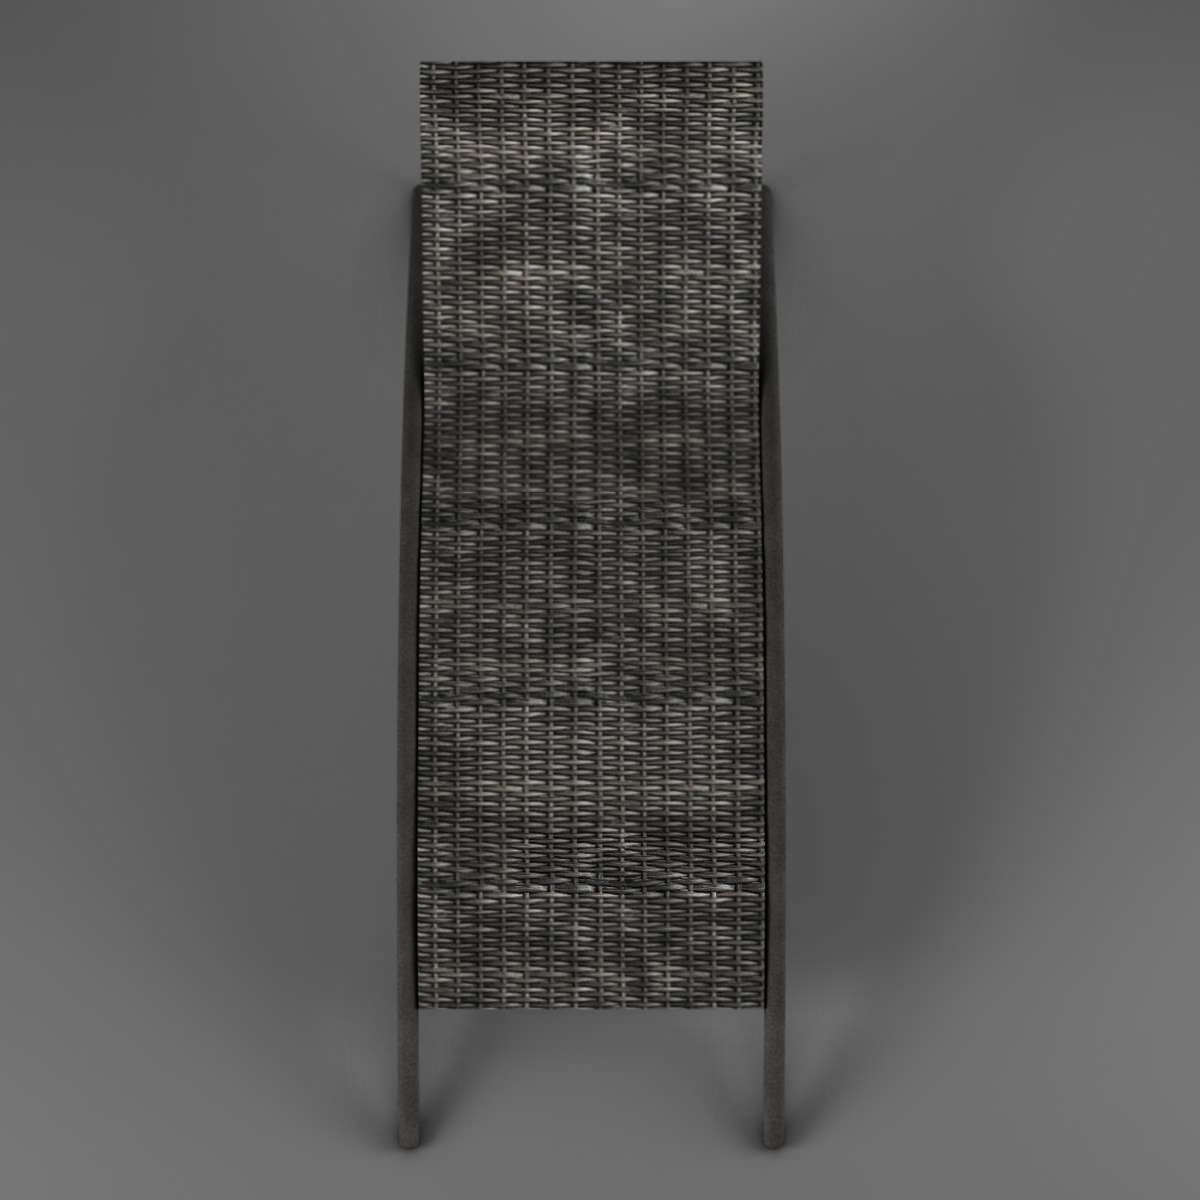 sunbed chair 3d model 3ds max fbx c4d ma mb obj 162641